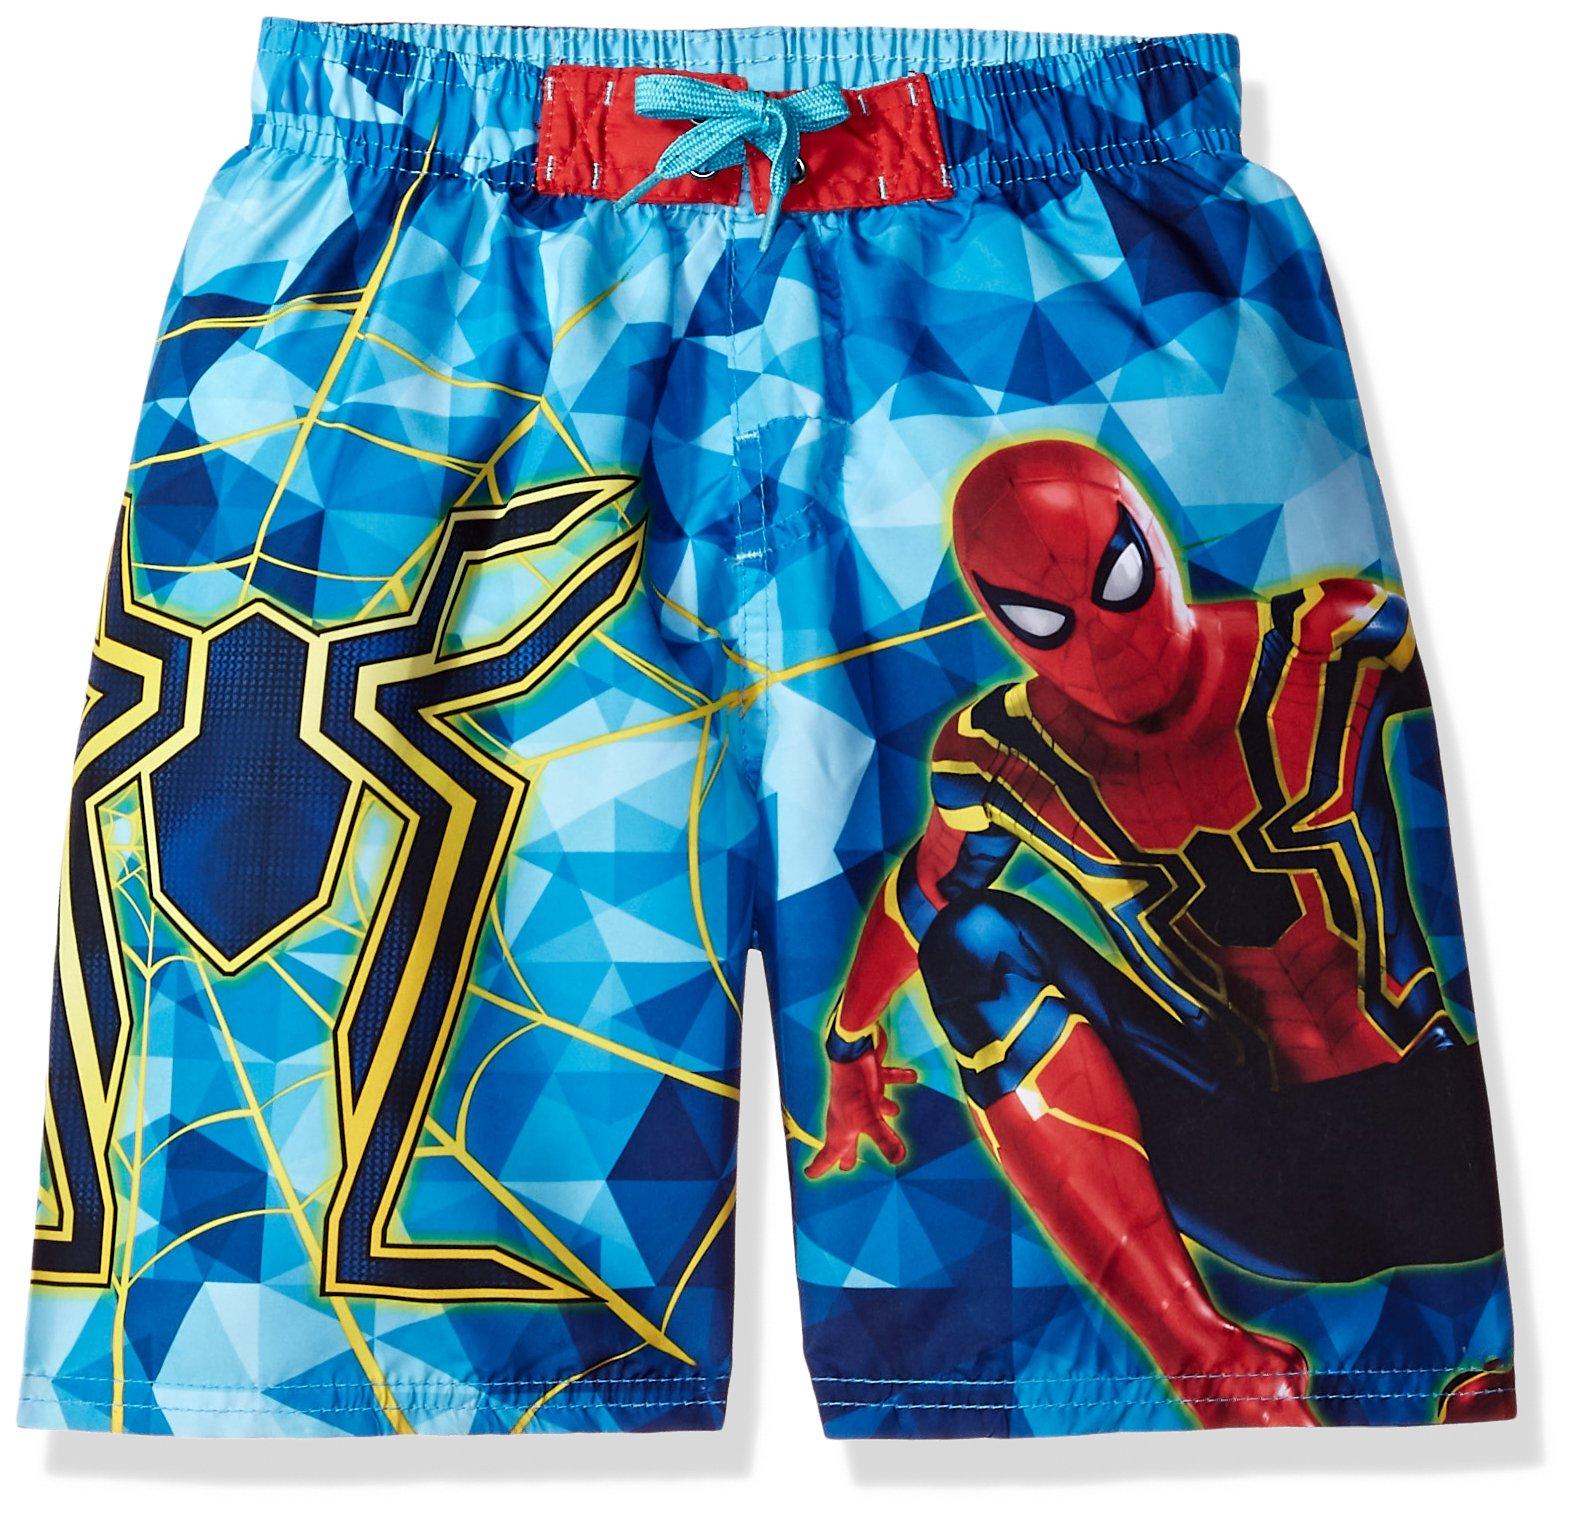 Marvel Little Boys' Infinity War Swim Shorts, Multi, 5/6